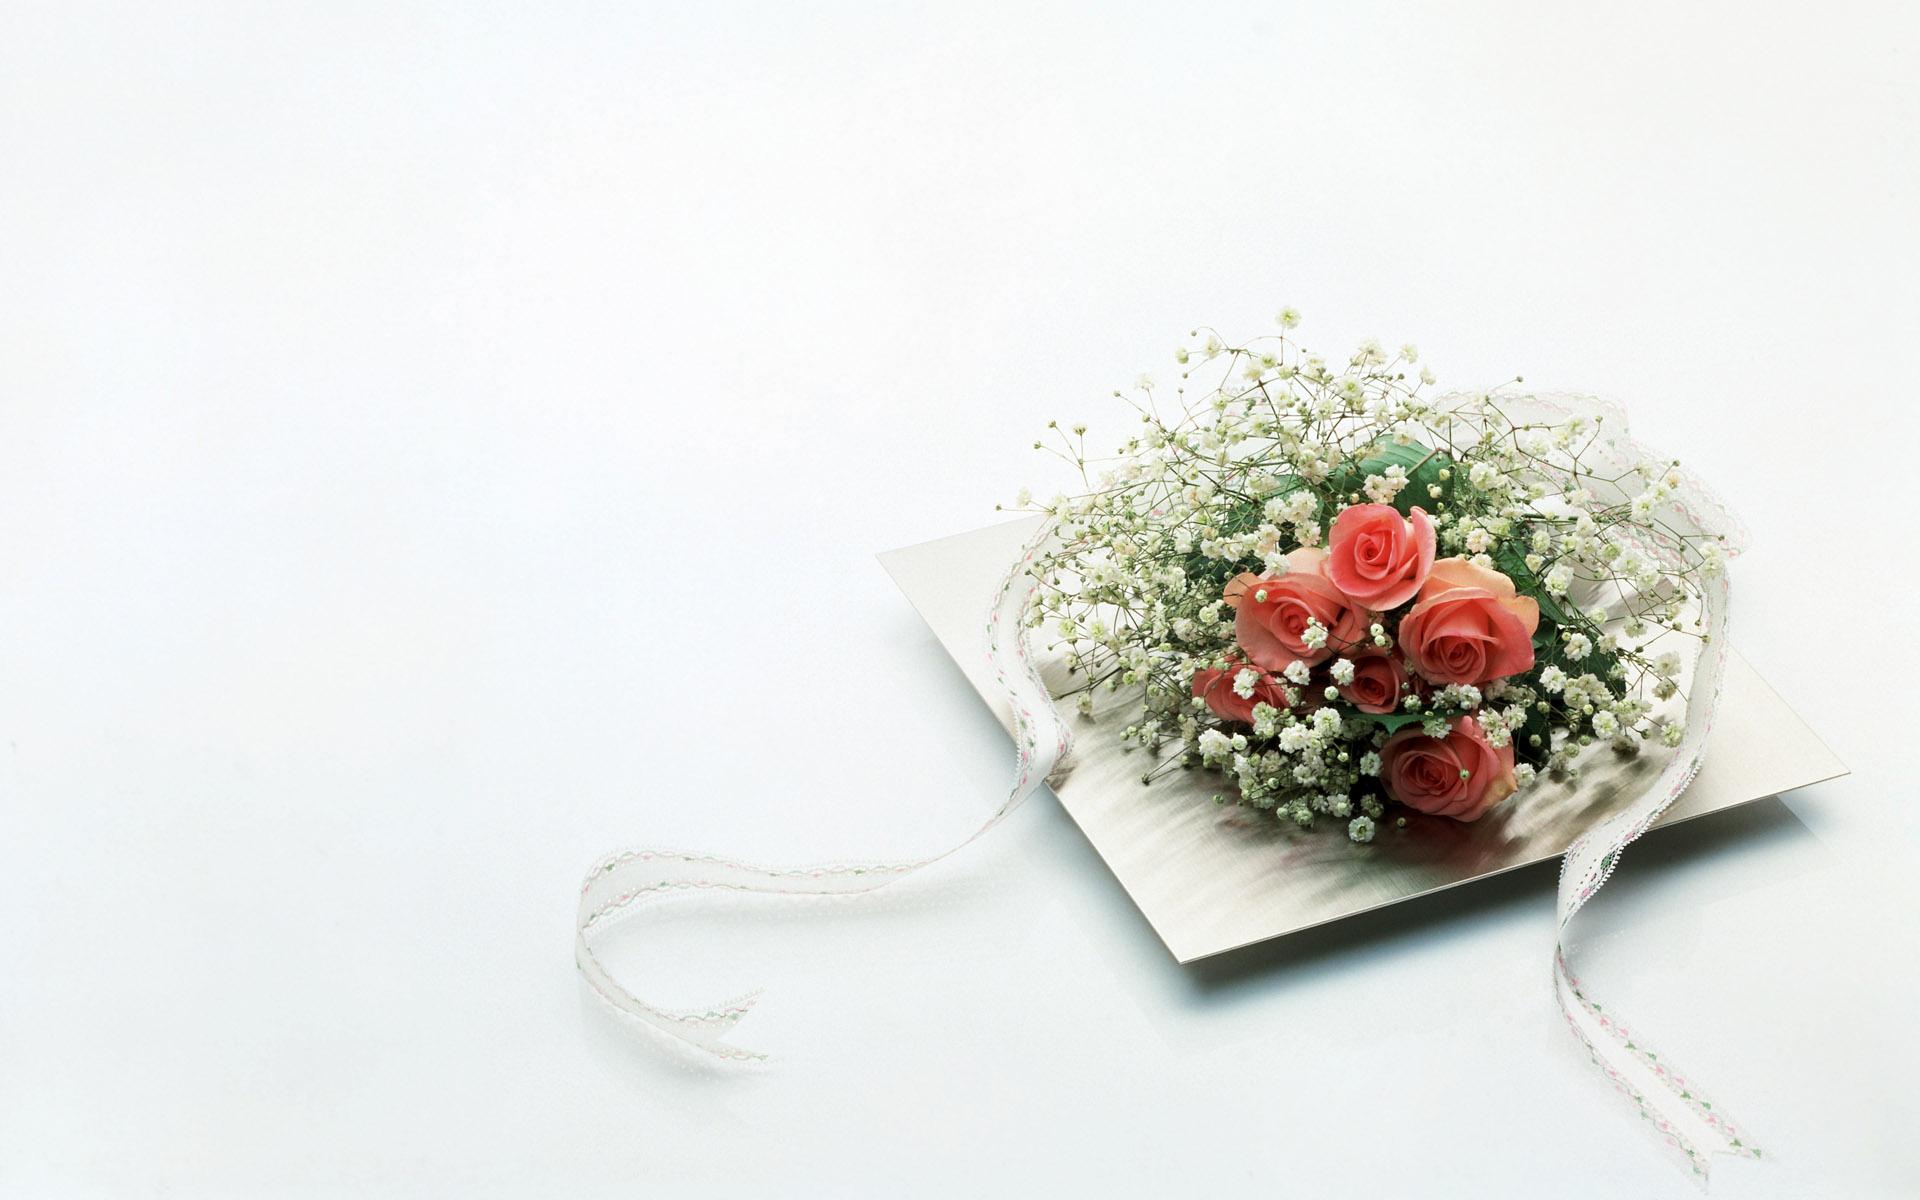 Wedding Flower Wallpaper - WallpaperSafari